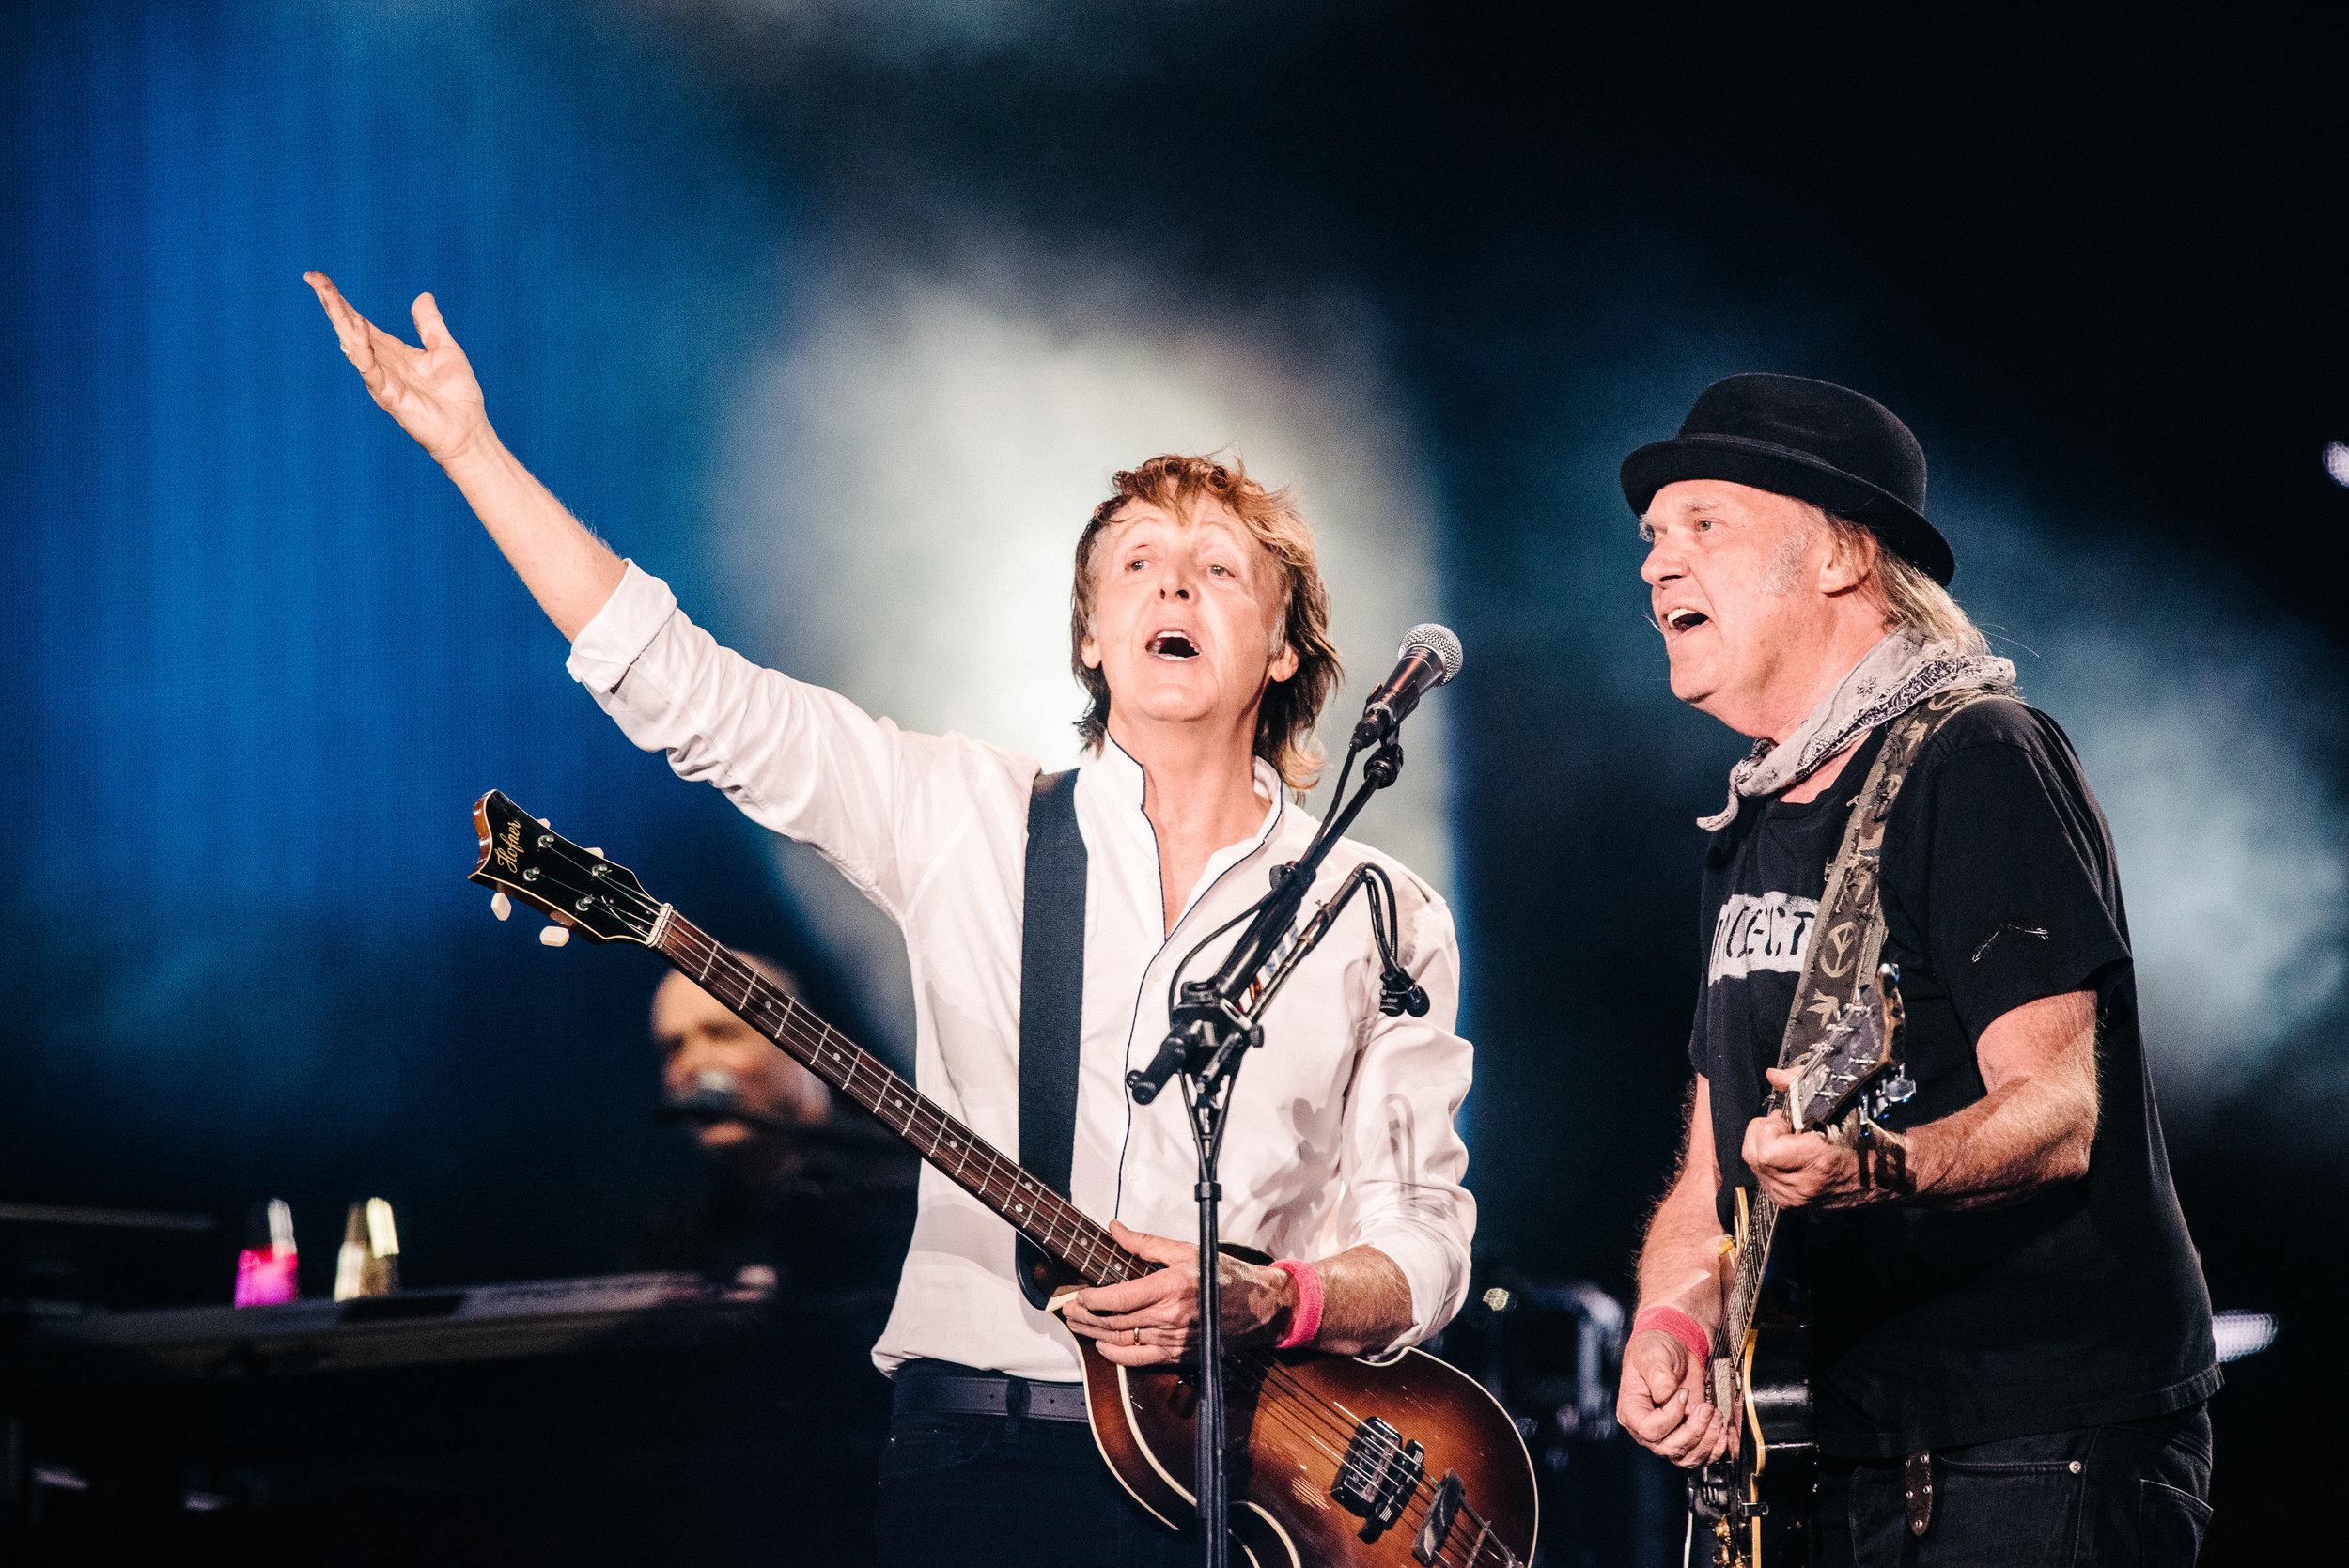 Paul McCartney & Neil Young